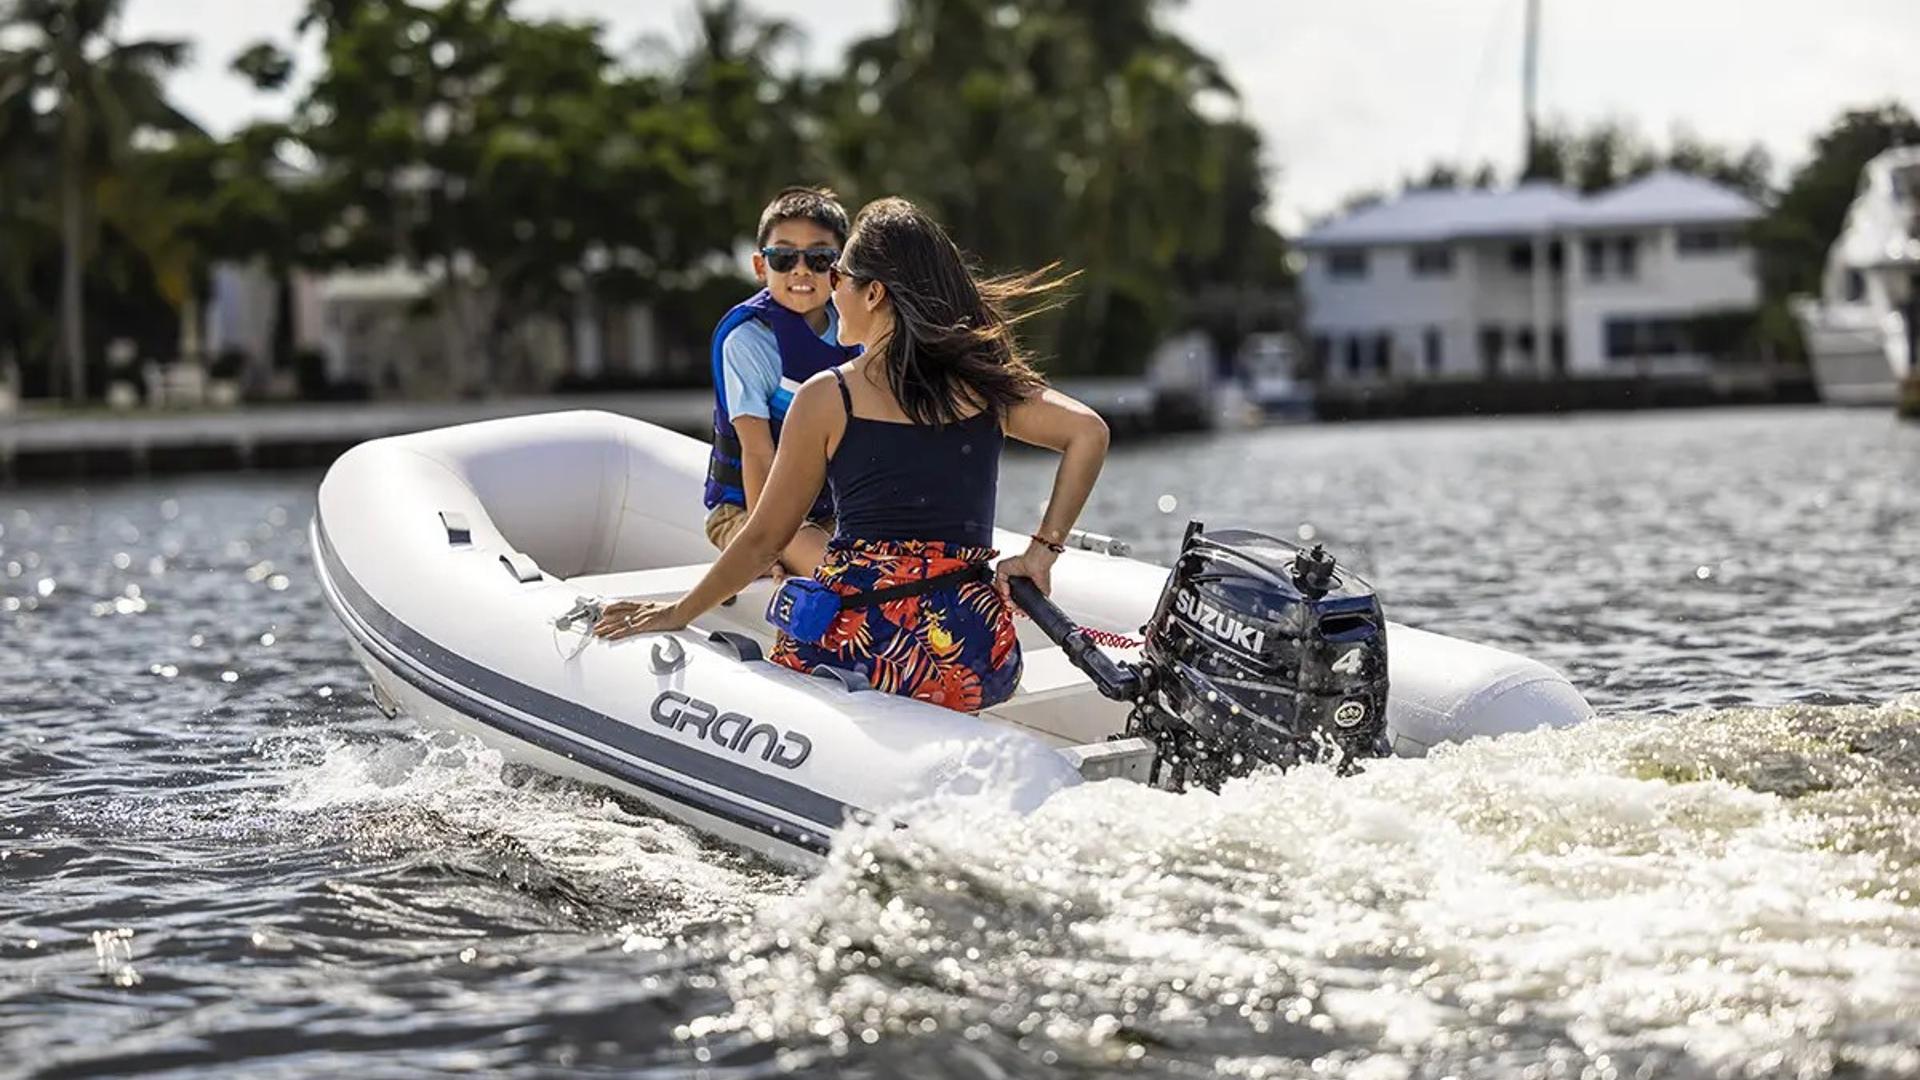 Надувная лодка с жестким дном GRAND Silver Line S300, Надувная лодка GRAND Silver Line S300, GRAND Silver Line S300, GRAND S300, GRAND Silver Line S300F, GRAND S300F, Надувная лодка GRAND, Надувная лодка ГРАНД, Надувная лодка с жестким дном, RIB, Rigid Inflatable Boats